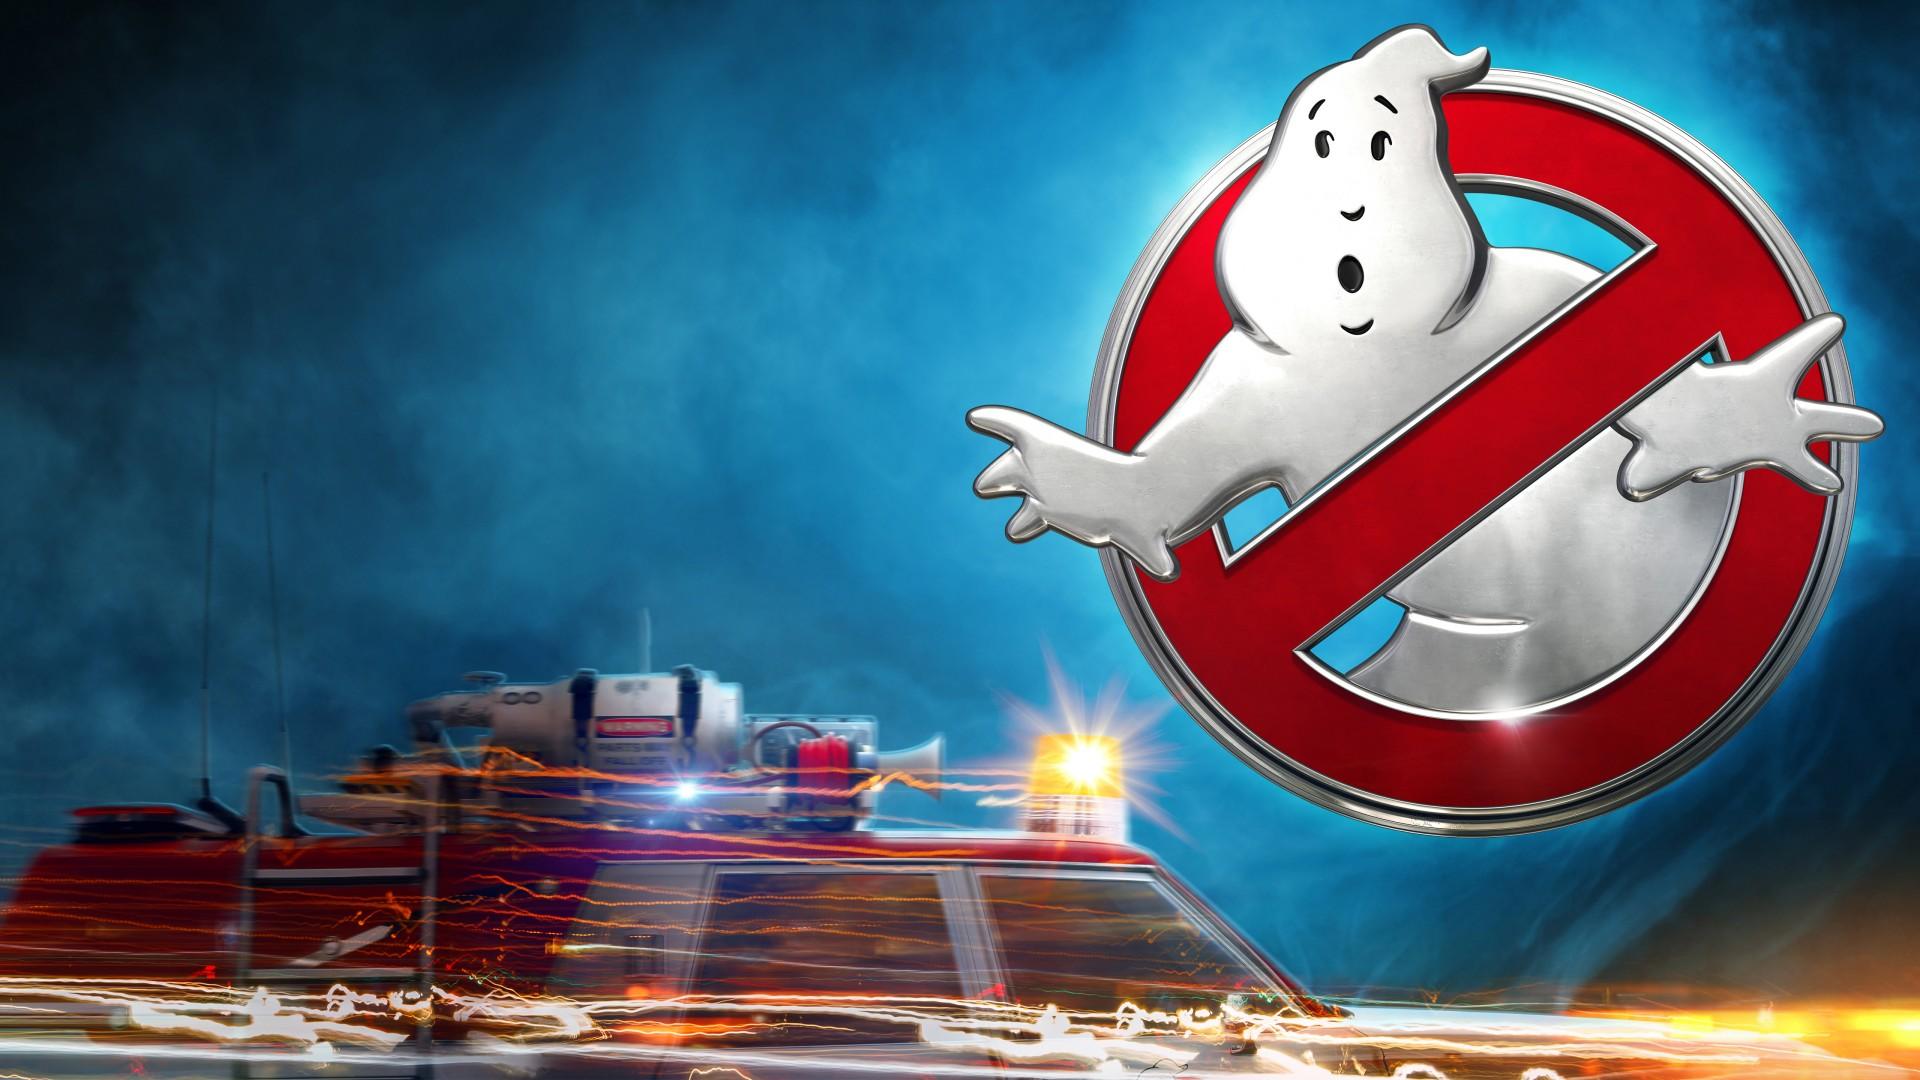 Ghostbusters 4K 5K 2016 Movie Wallpapers HD Wallpapers